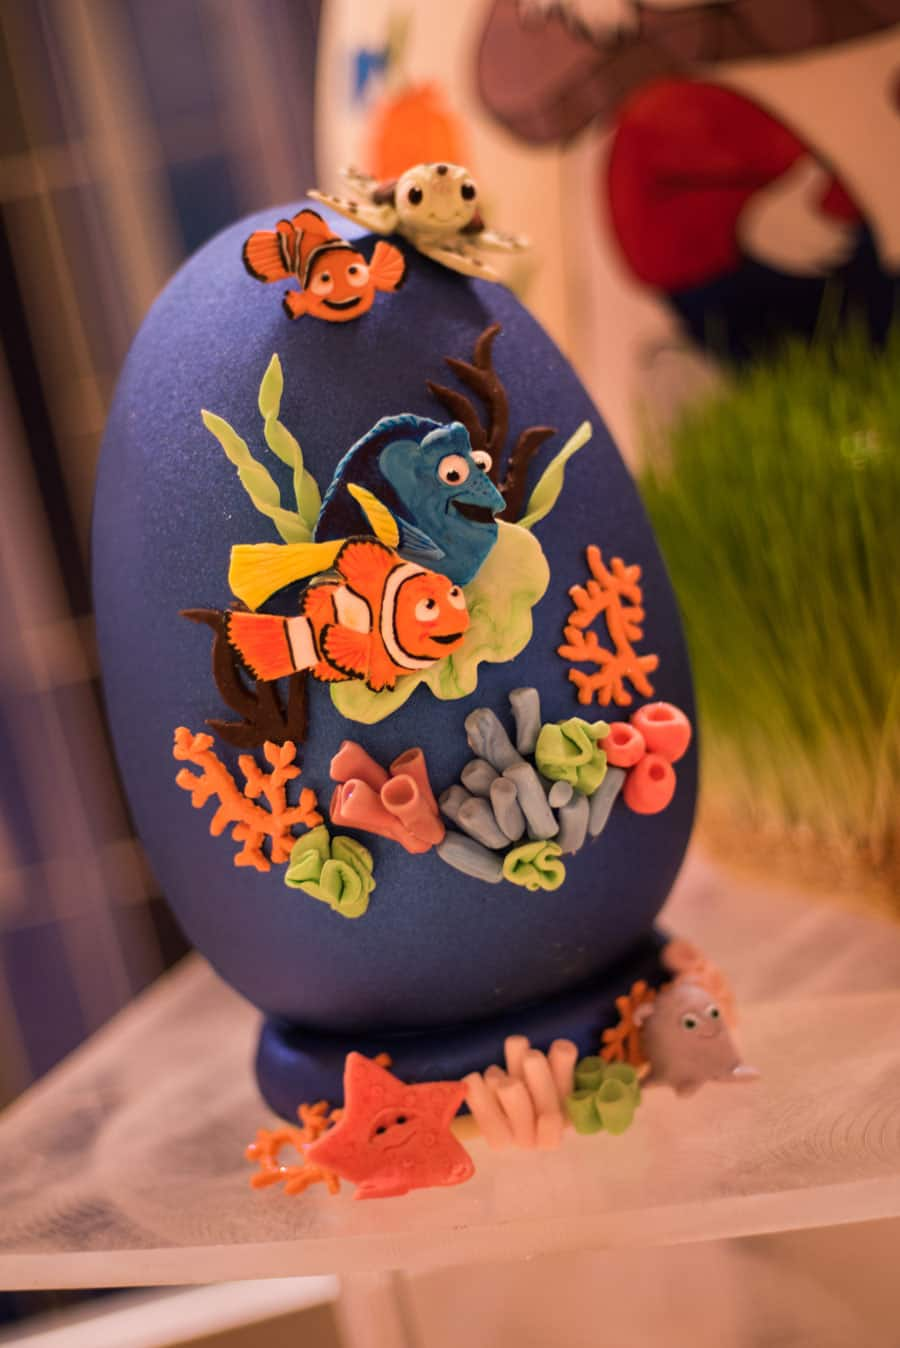 Finding Nemo Easter Egg at Disney's Contemporary Resort